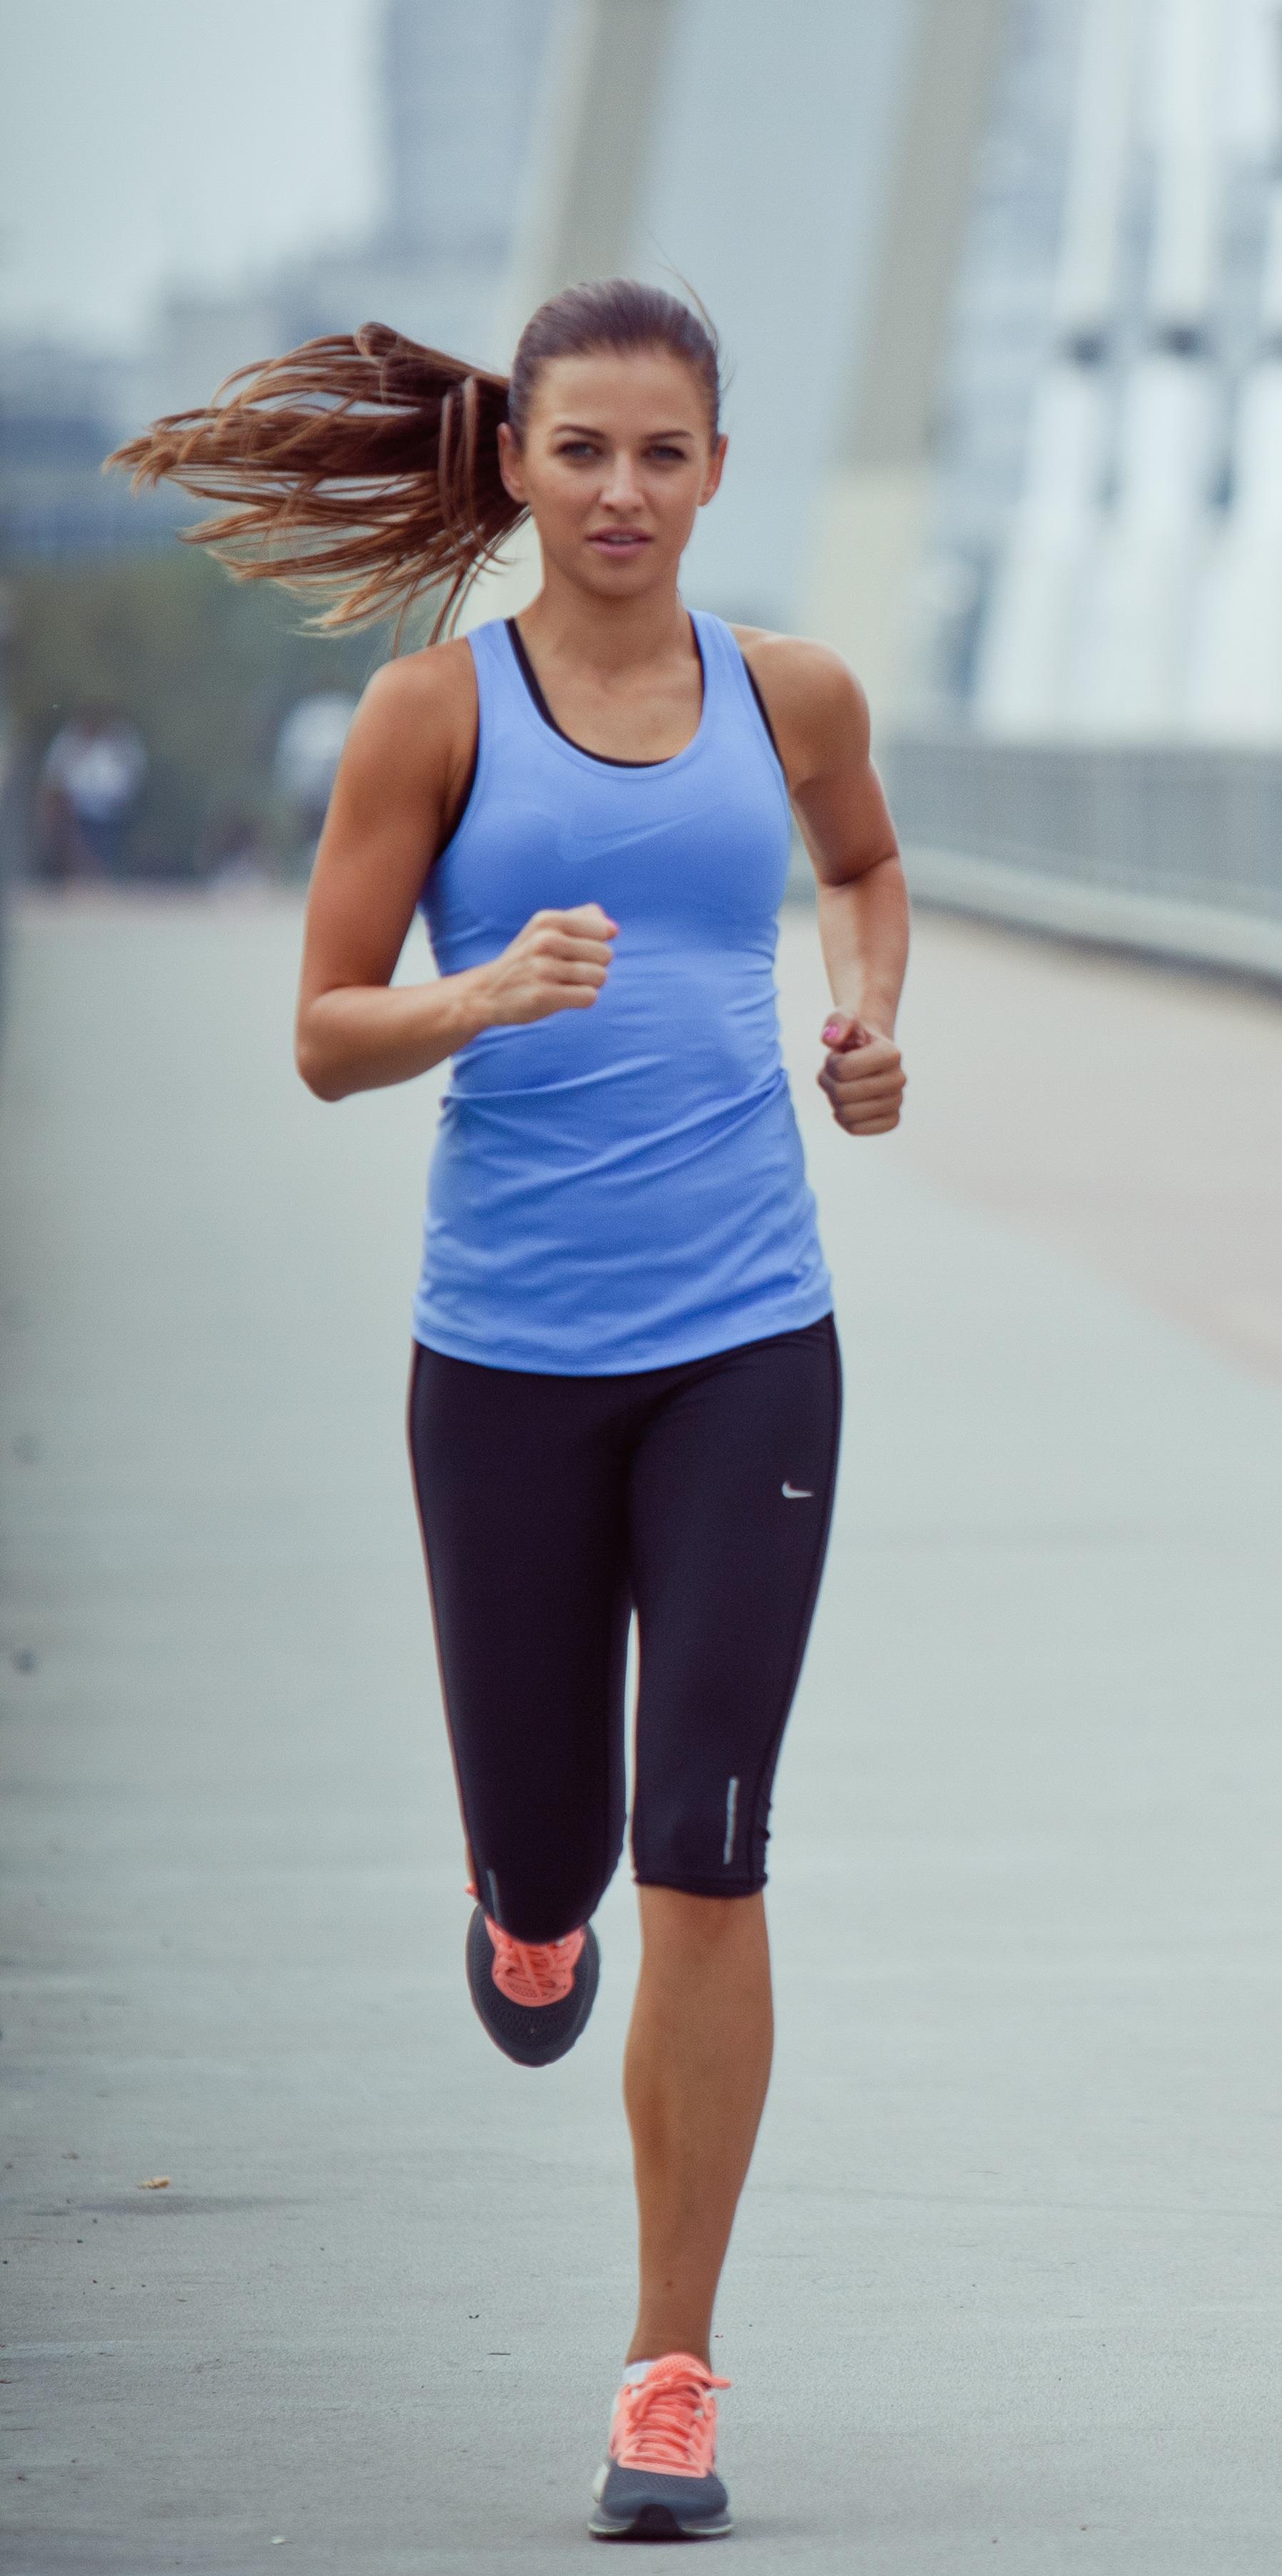 Trening na NOGI I POŚLADKI! - Anna Lewandowska - healthy plan by Ann